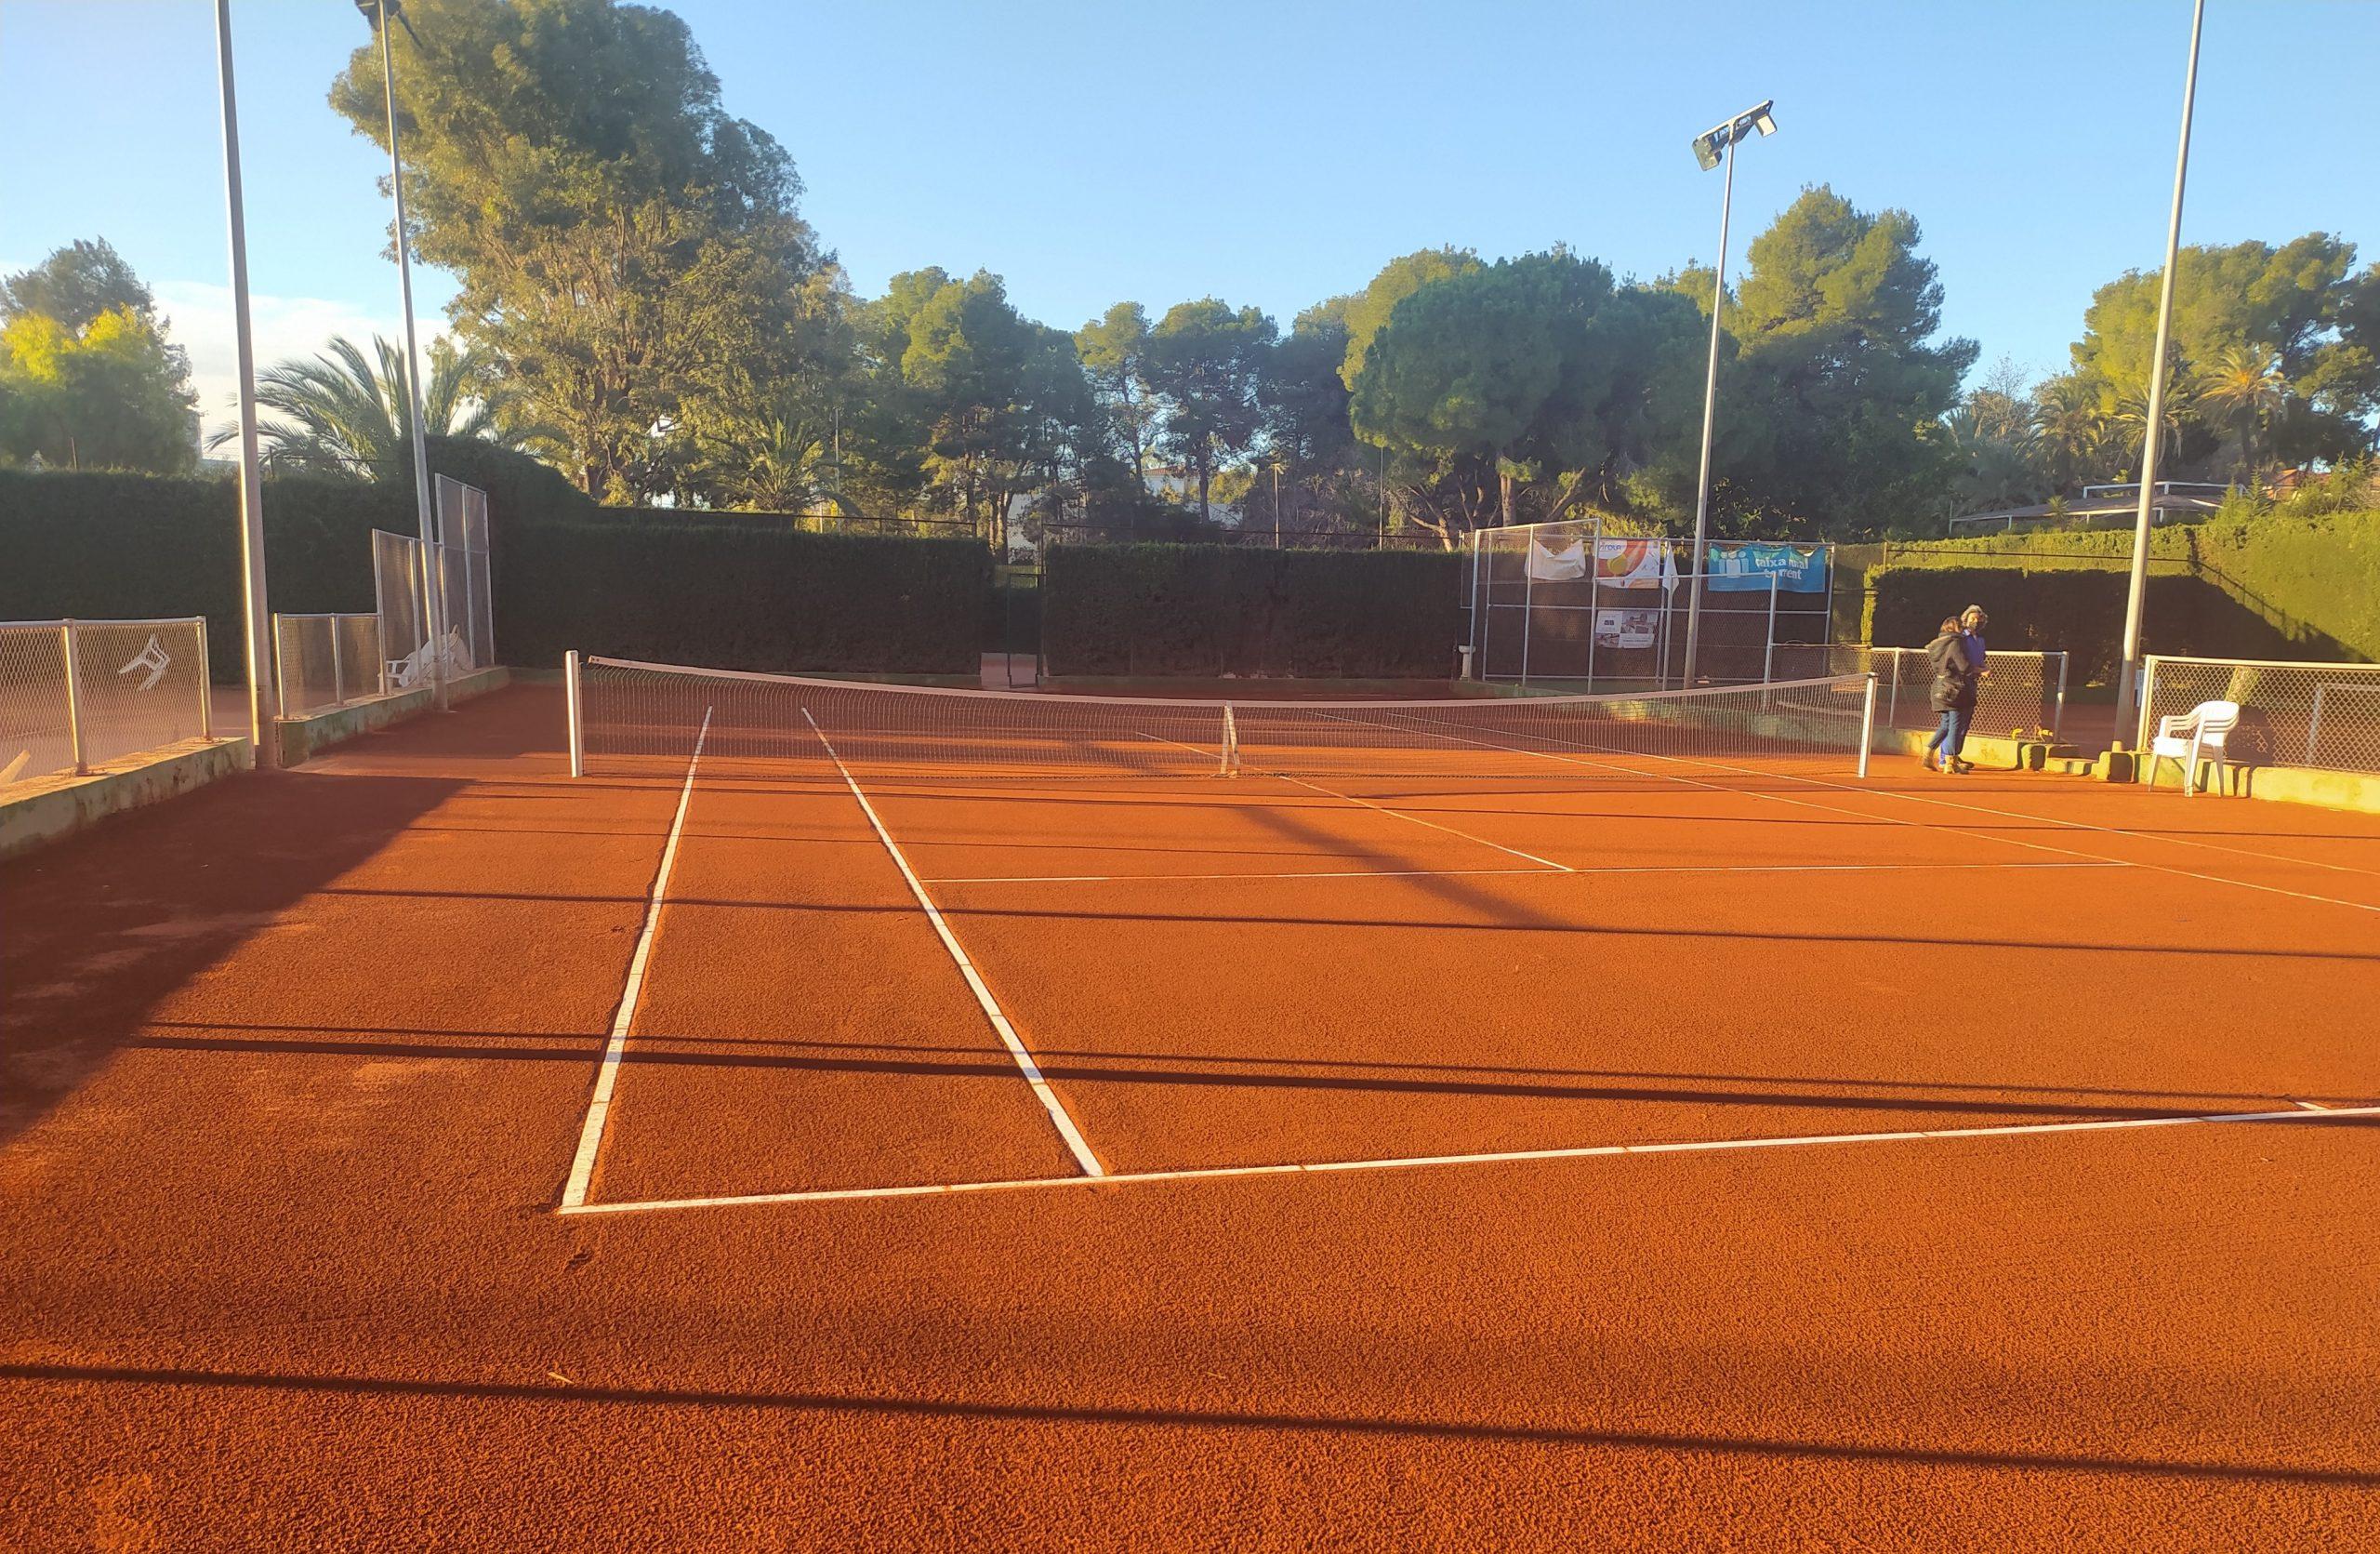 renovacion-completa-pista-tenis-tierra-batida-celabasa